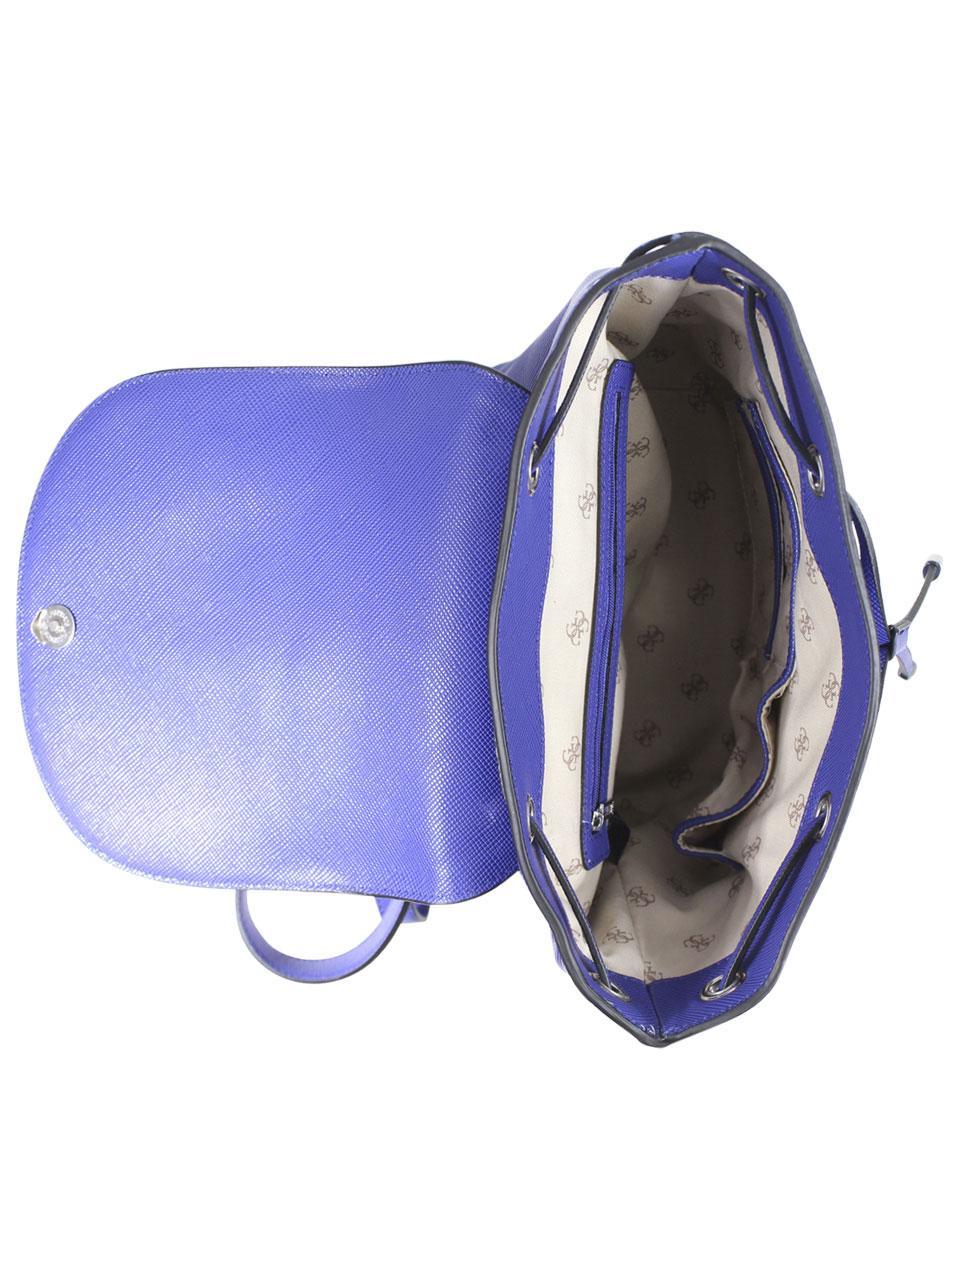 Guess-Women-039-s-Varsity-Pop-Pin-Up-Backpack-Bag thumbnail 15